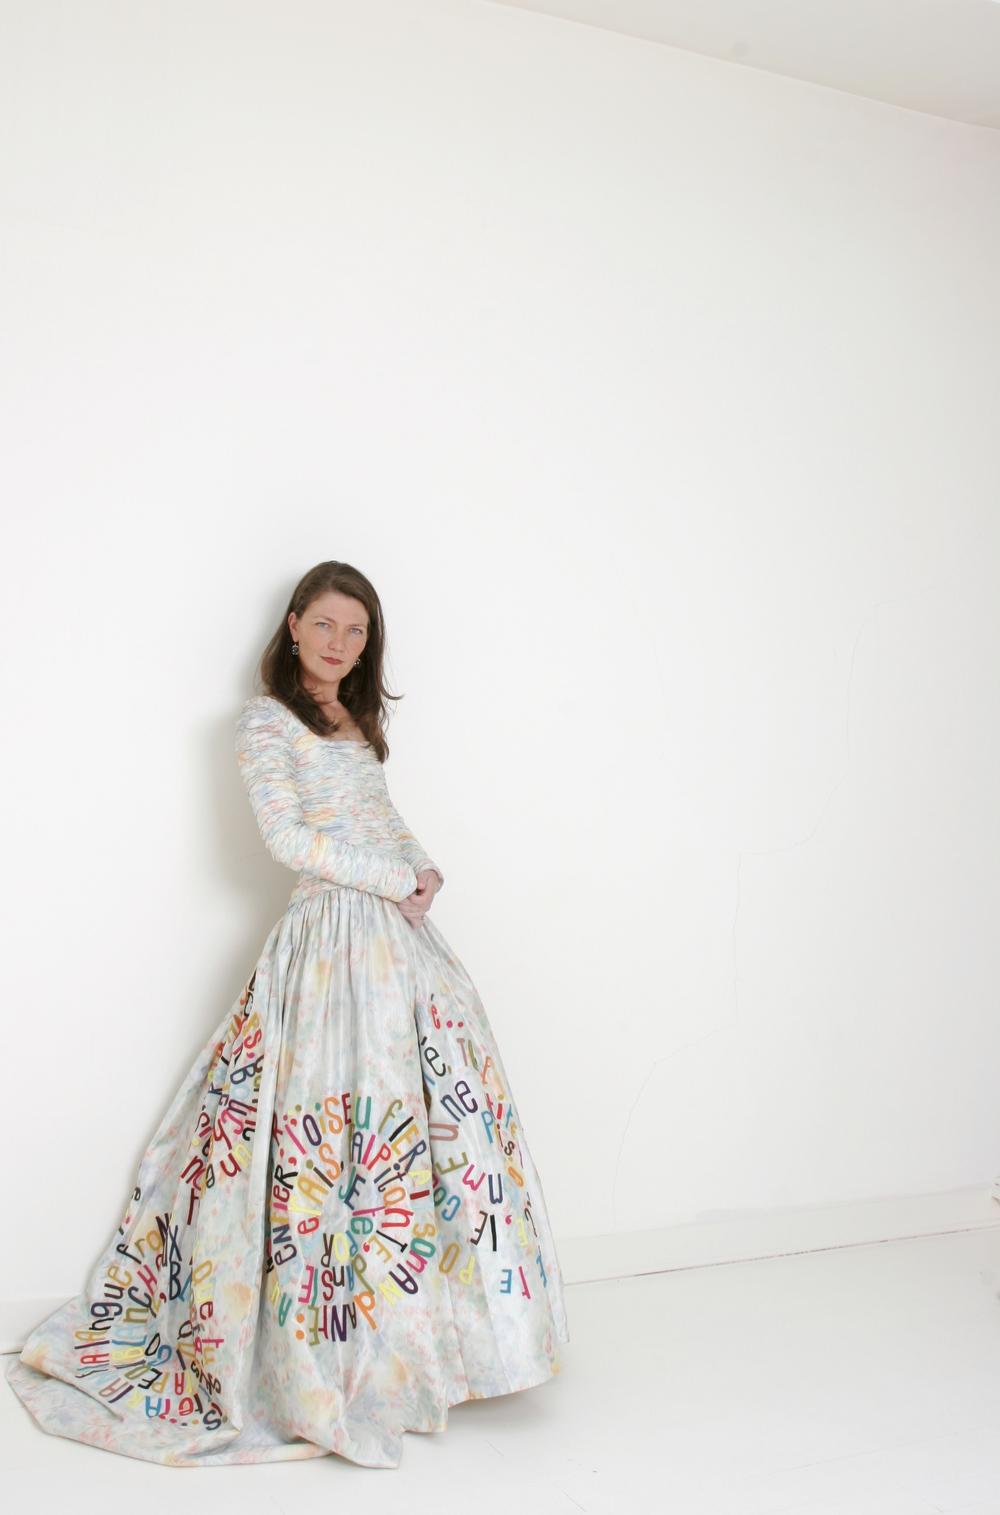 Kate Daudy - Portrait in Dress